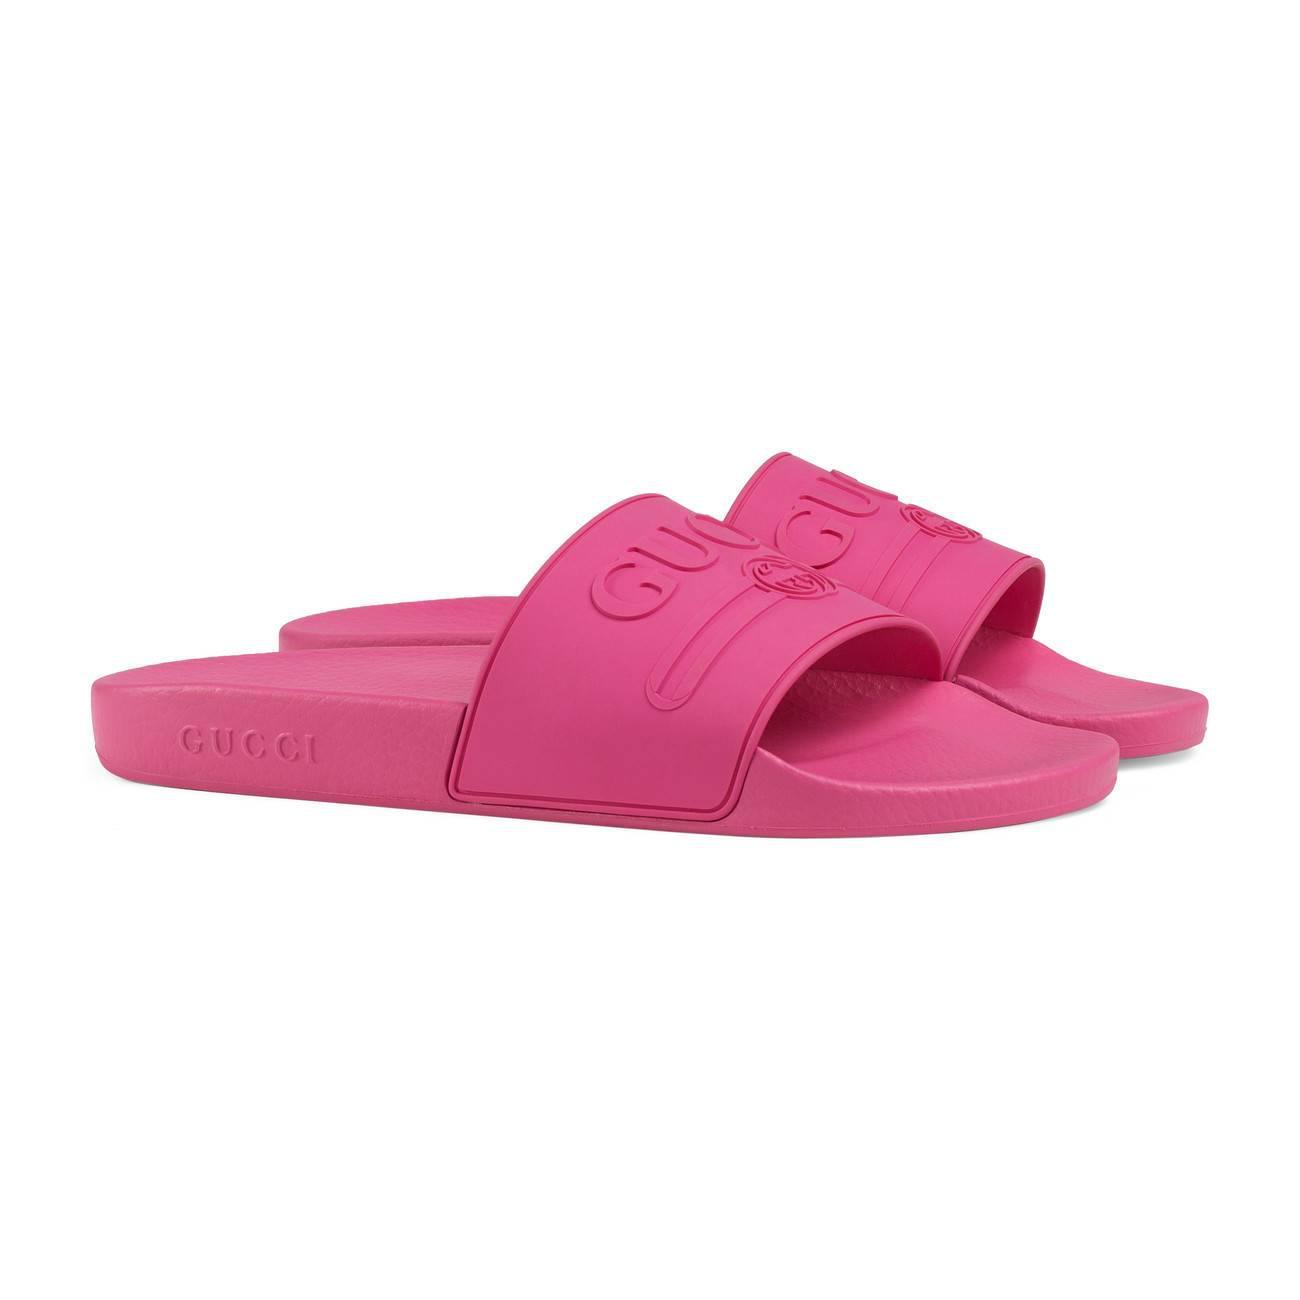 953115650a73e3 Gucci - Purple Logo Rubber Slide Sandal for Men - Lyst. View fullscreen